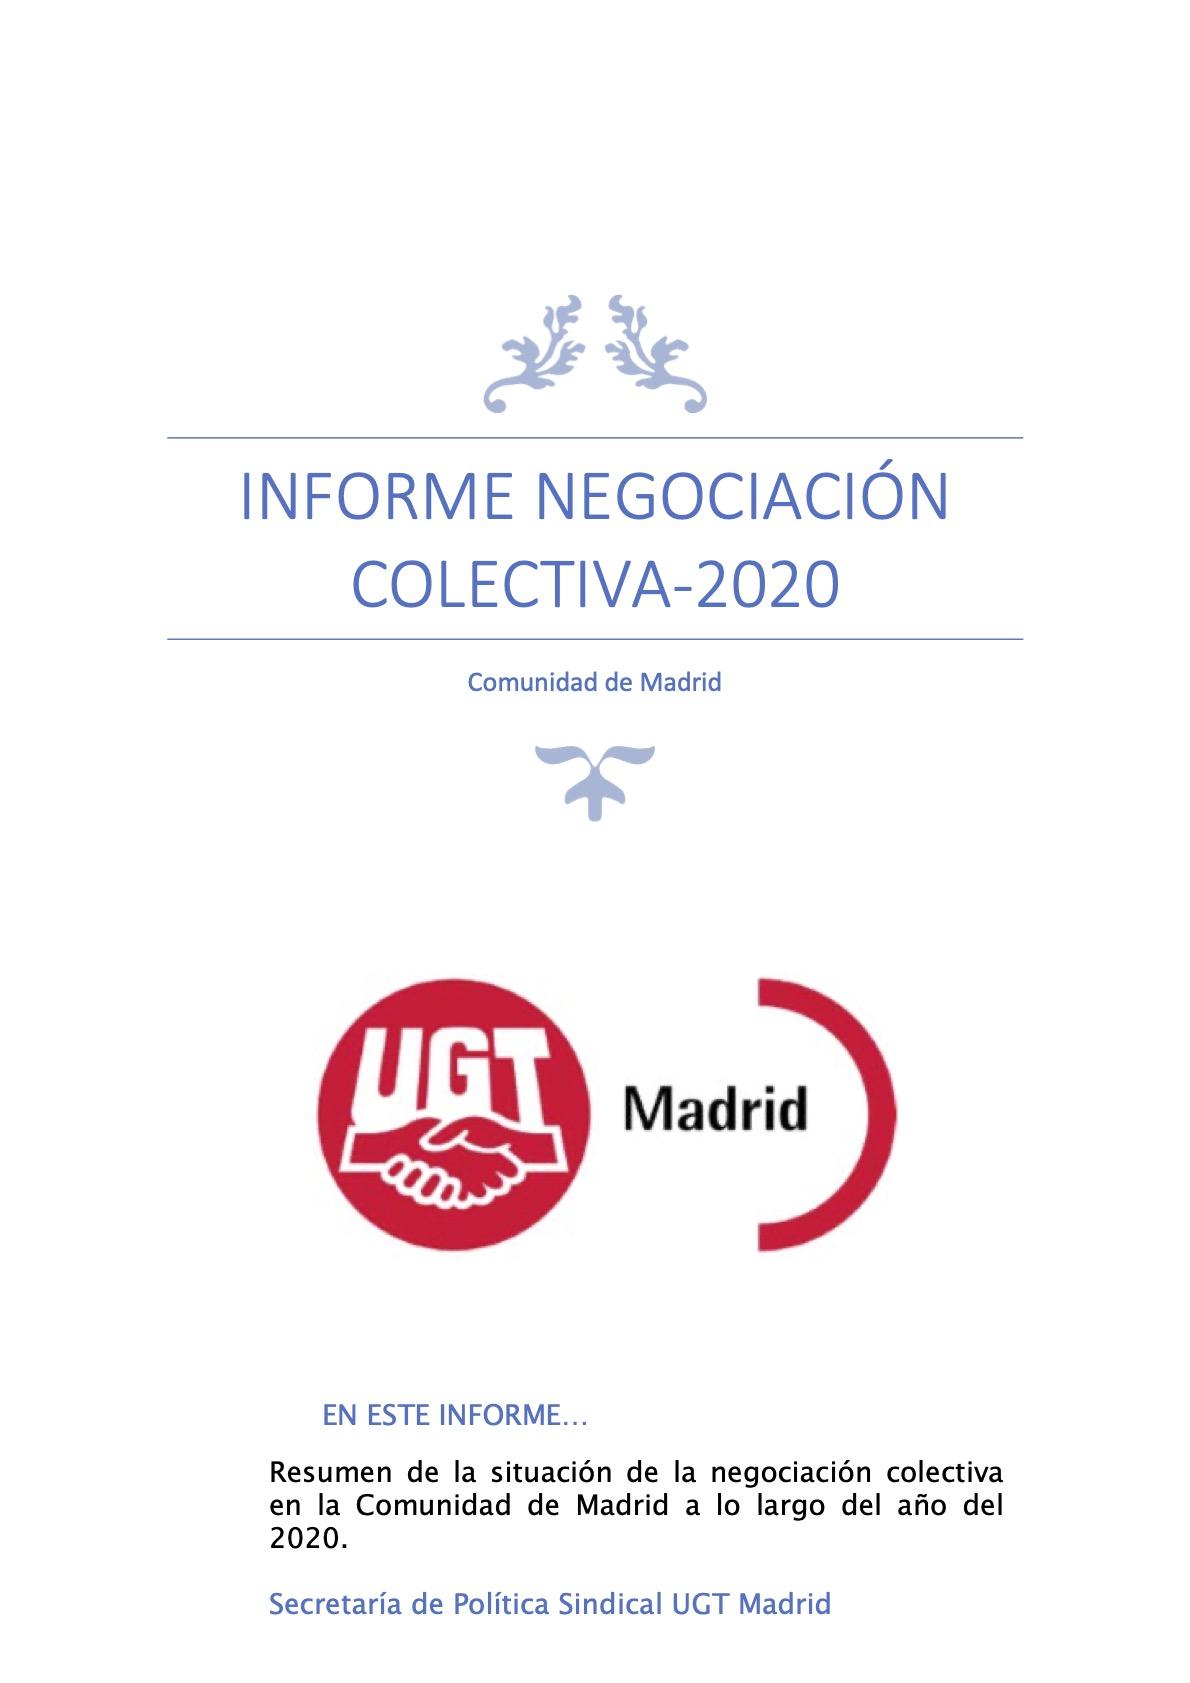 Informe Negociación Colectiva Año 2020